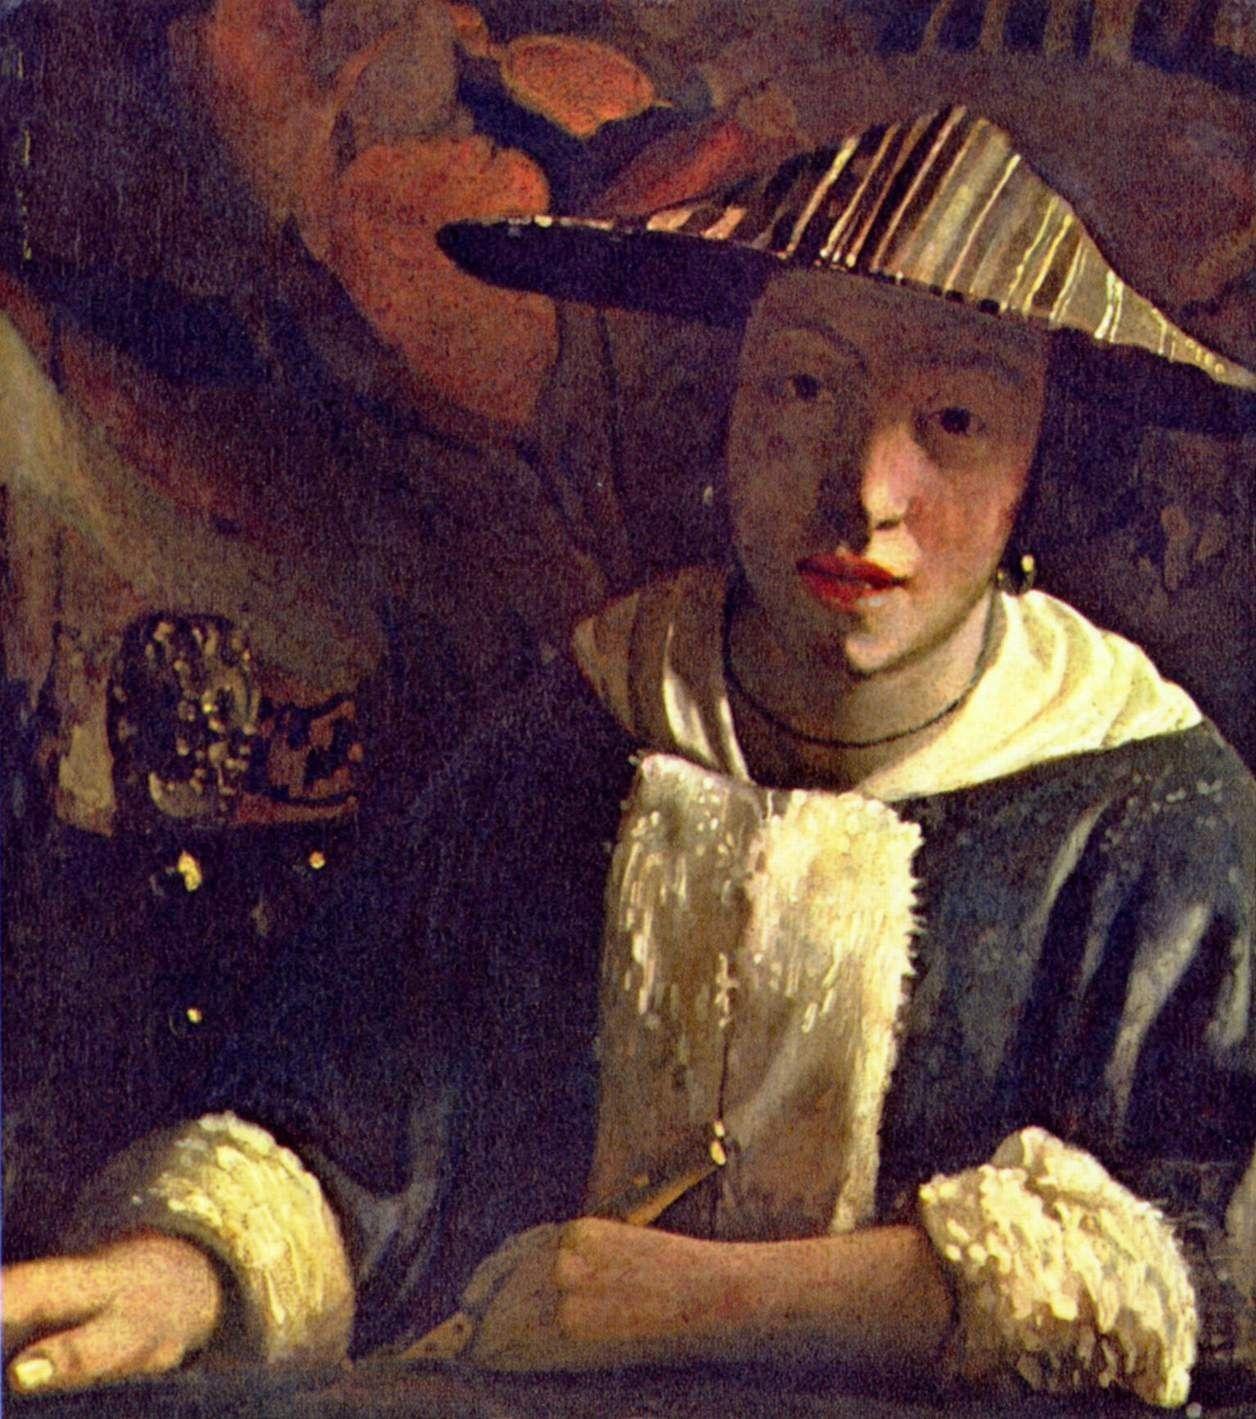 Genremalerei berühmt  Jan Vermeer van Delft. Mädchen mit Flöte. Um 1666, Öl auf Leinwand ...